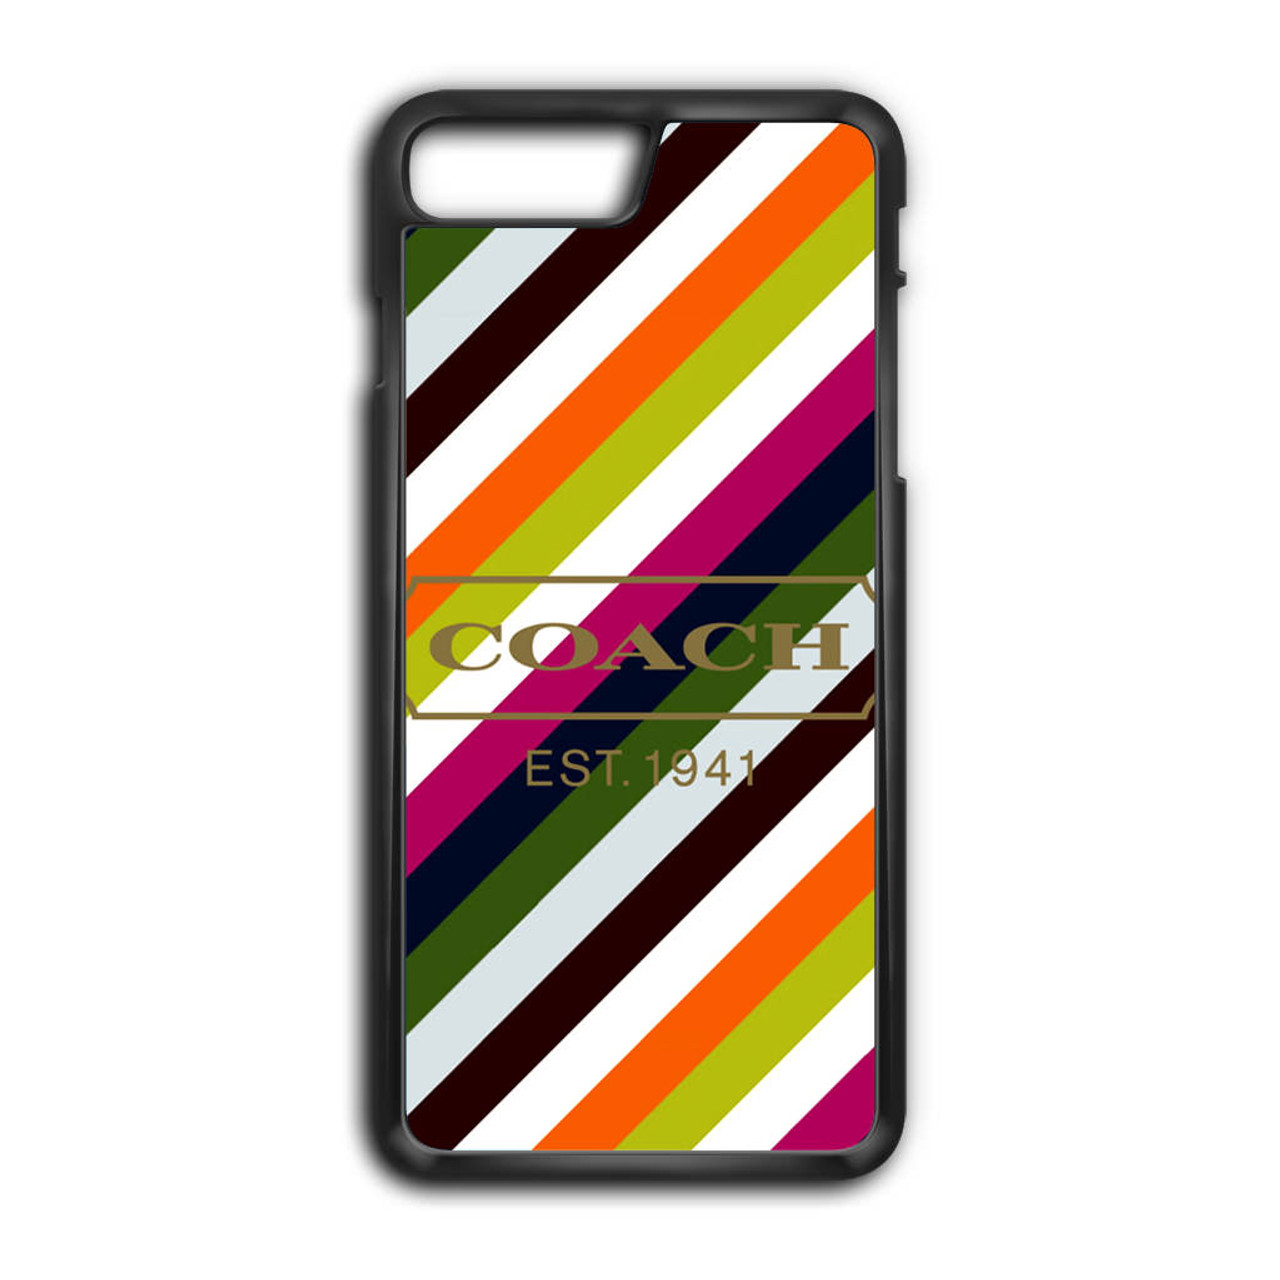 Coach iPhone 7 Plus Case - CASESHUNTER 9ce0fc1fbf6e